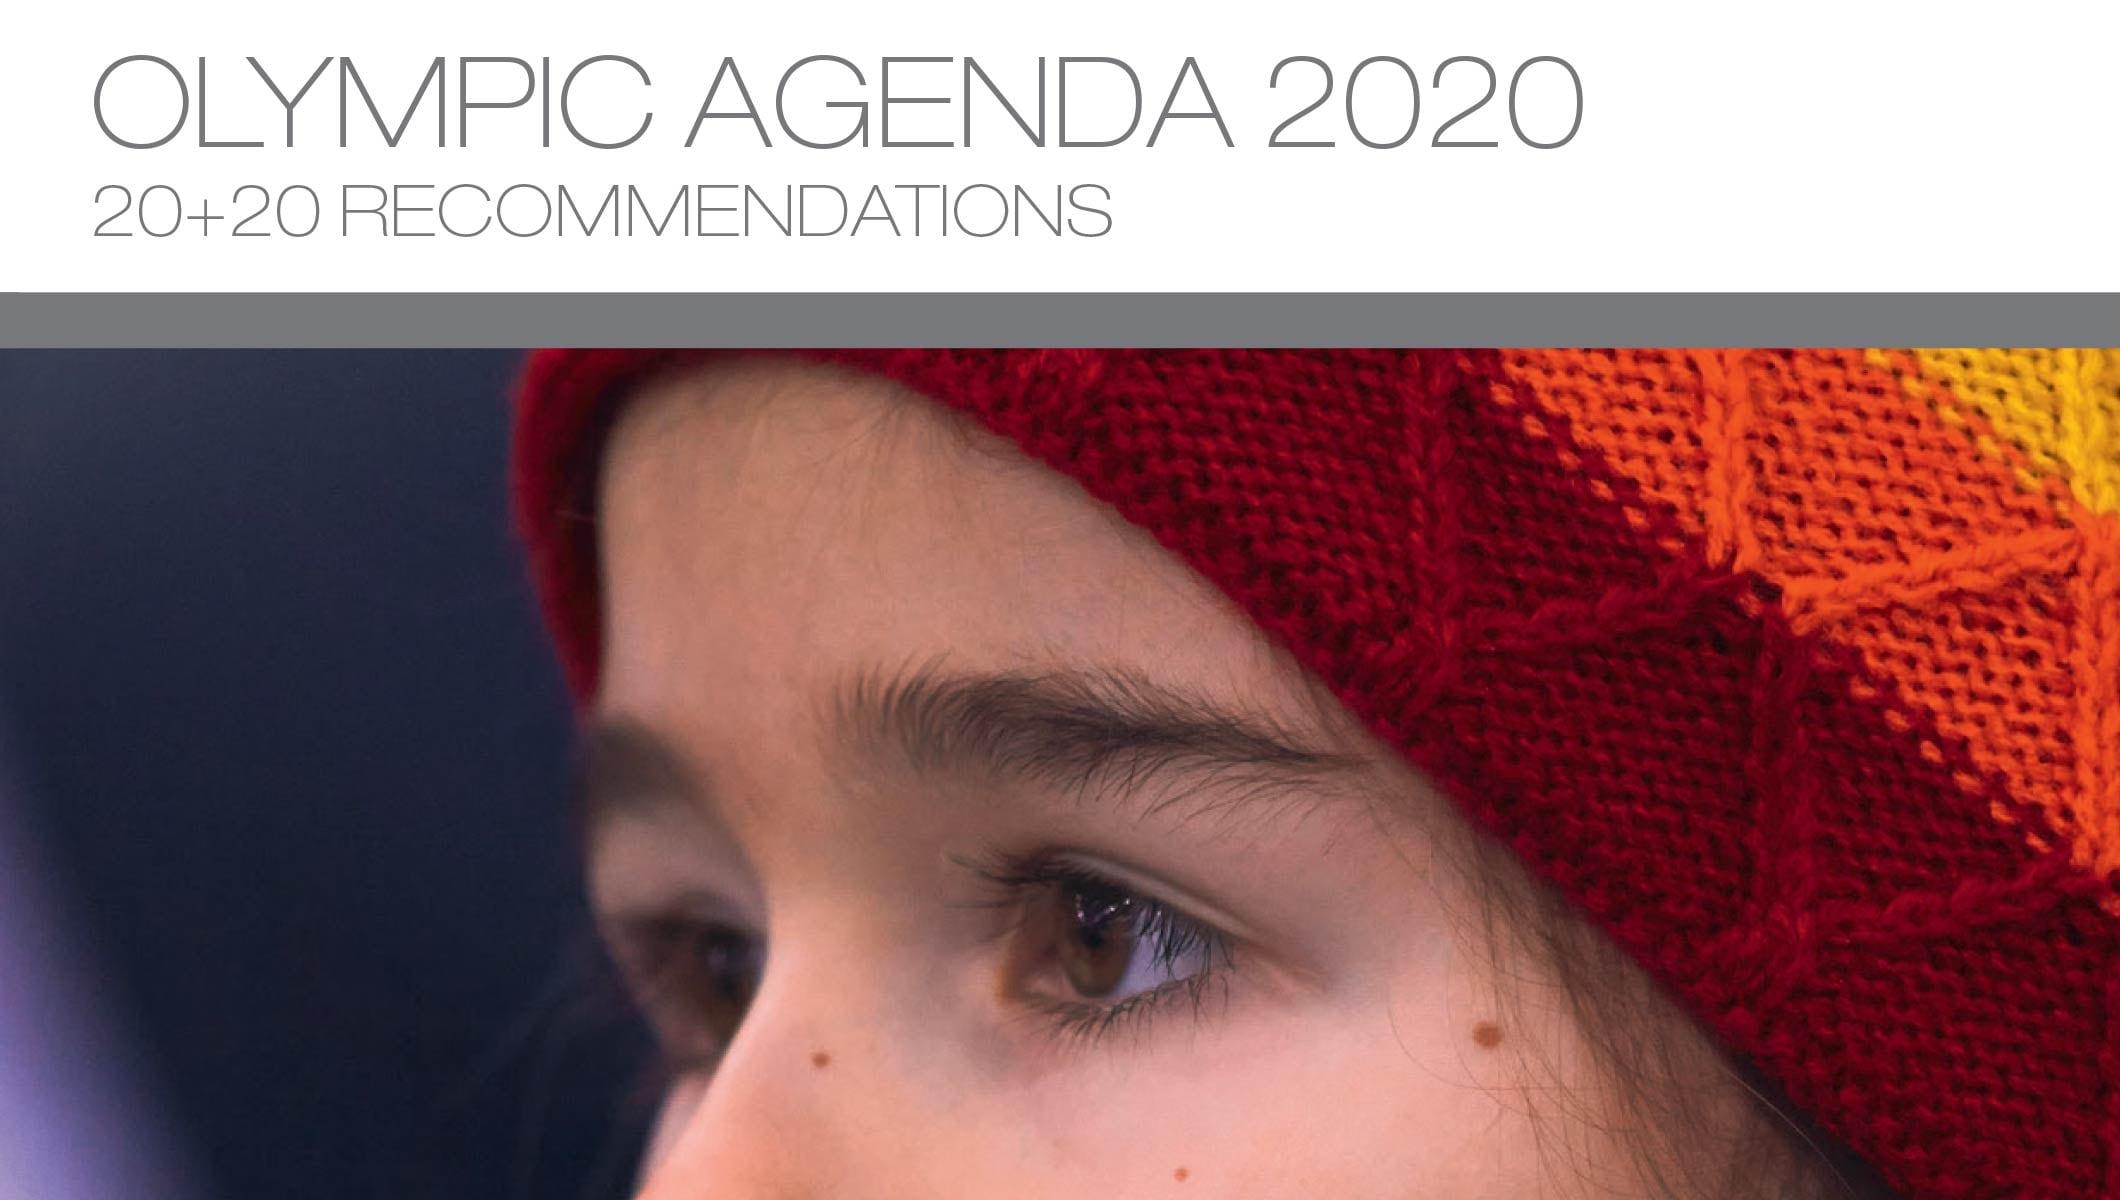 Olympic Agenda 2020